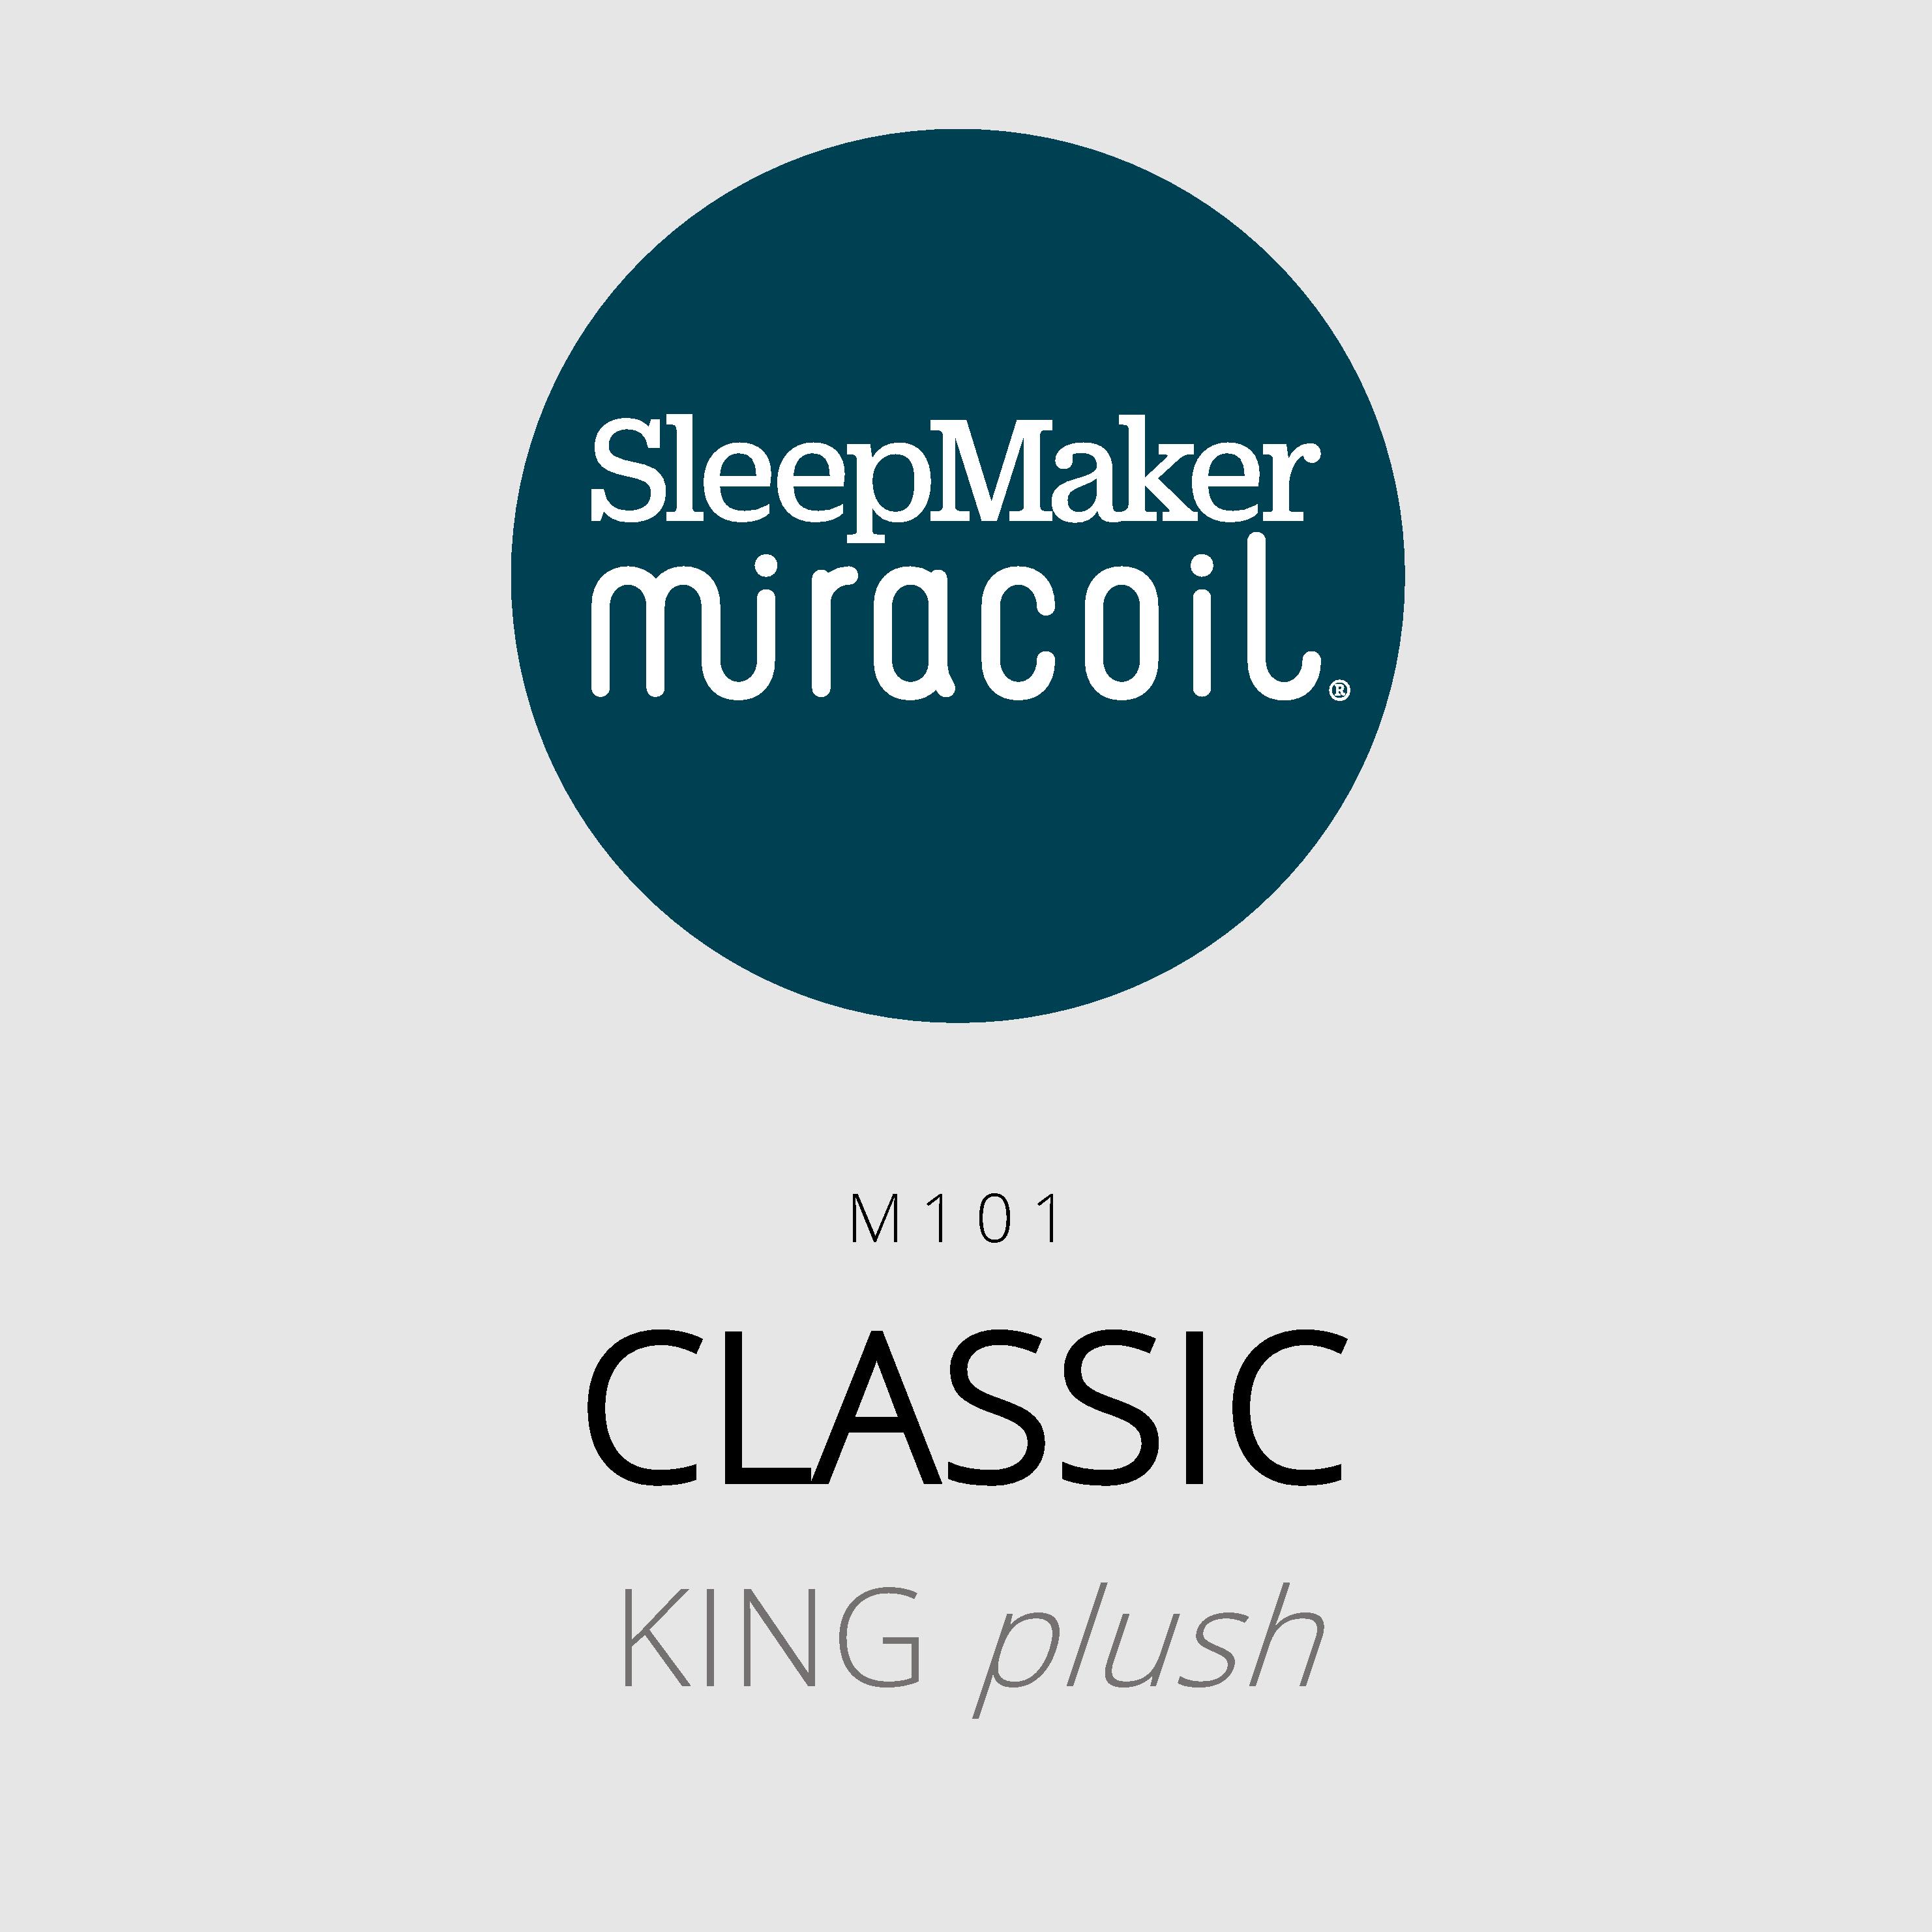 SleepMaker Miracoil – Classic – M101 – King Plush Mattress